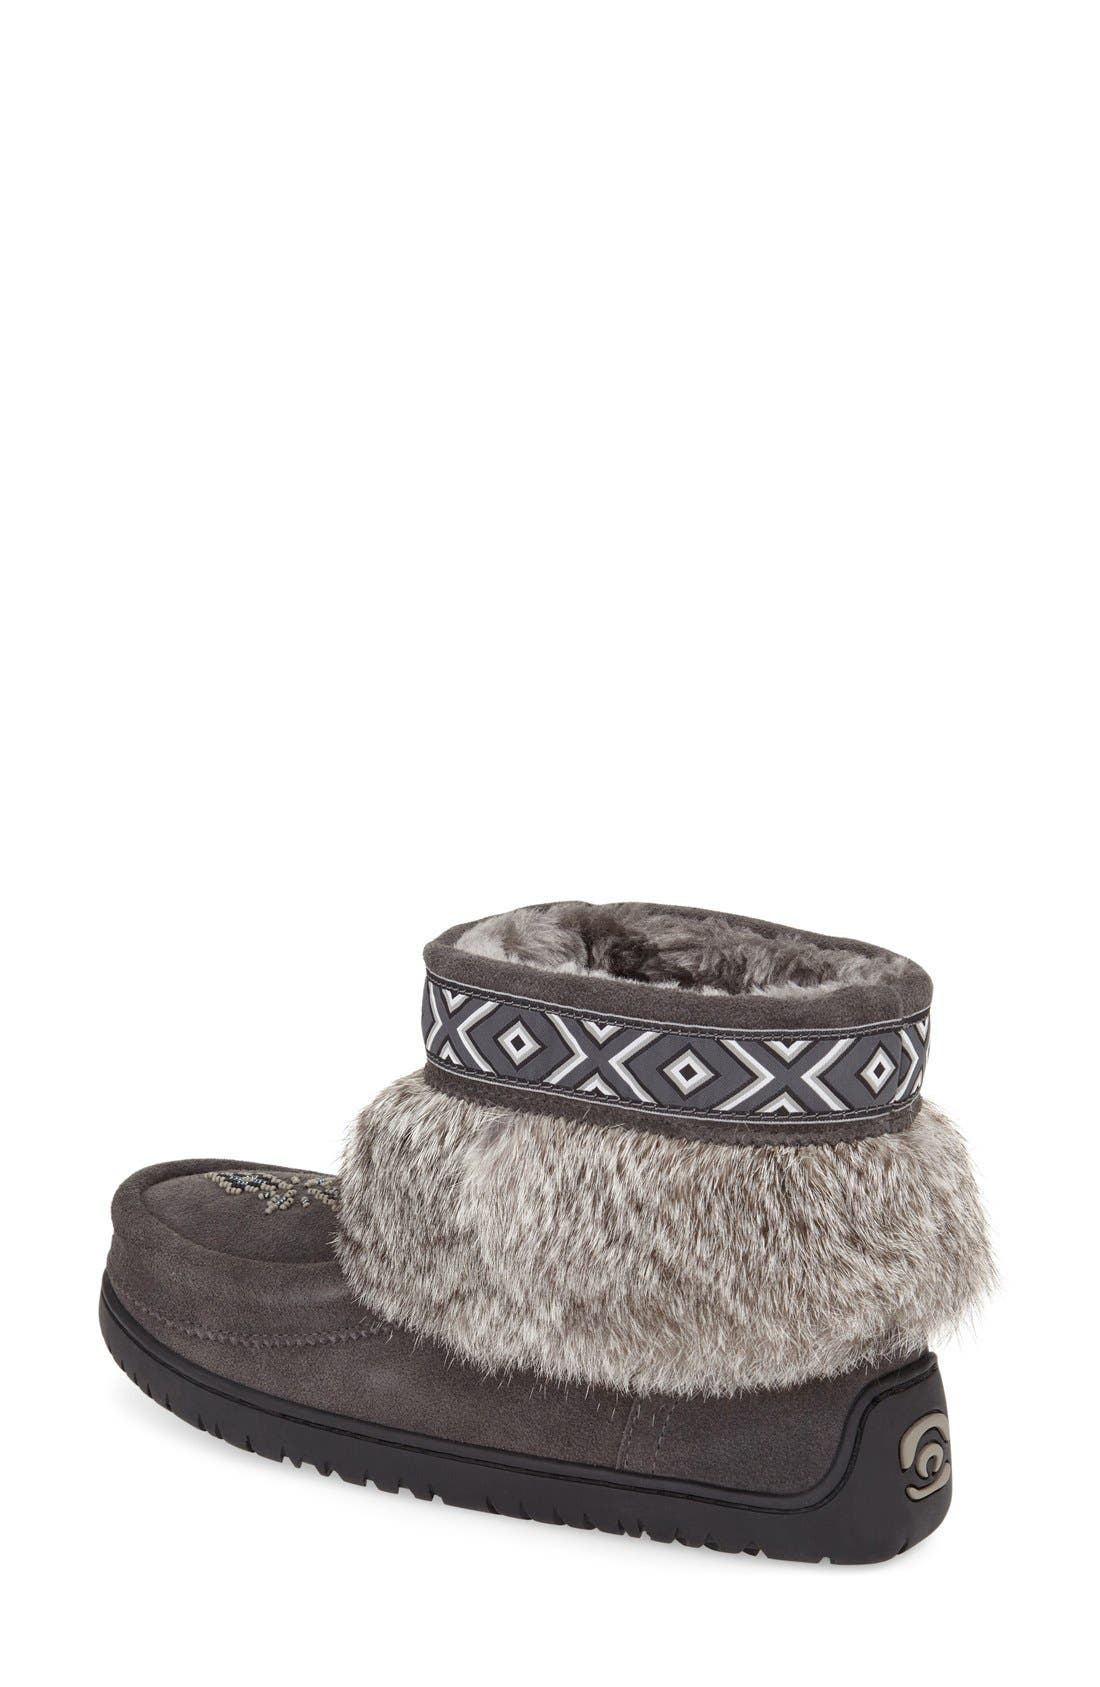 Alternate Image 2  - Manitobah Mukluks 'Keewatin' Genuine Shearling and Rabbit Fur Boot (Women)